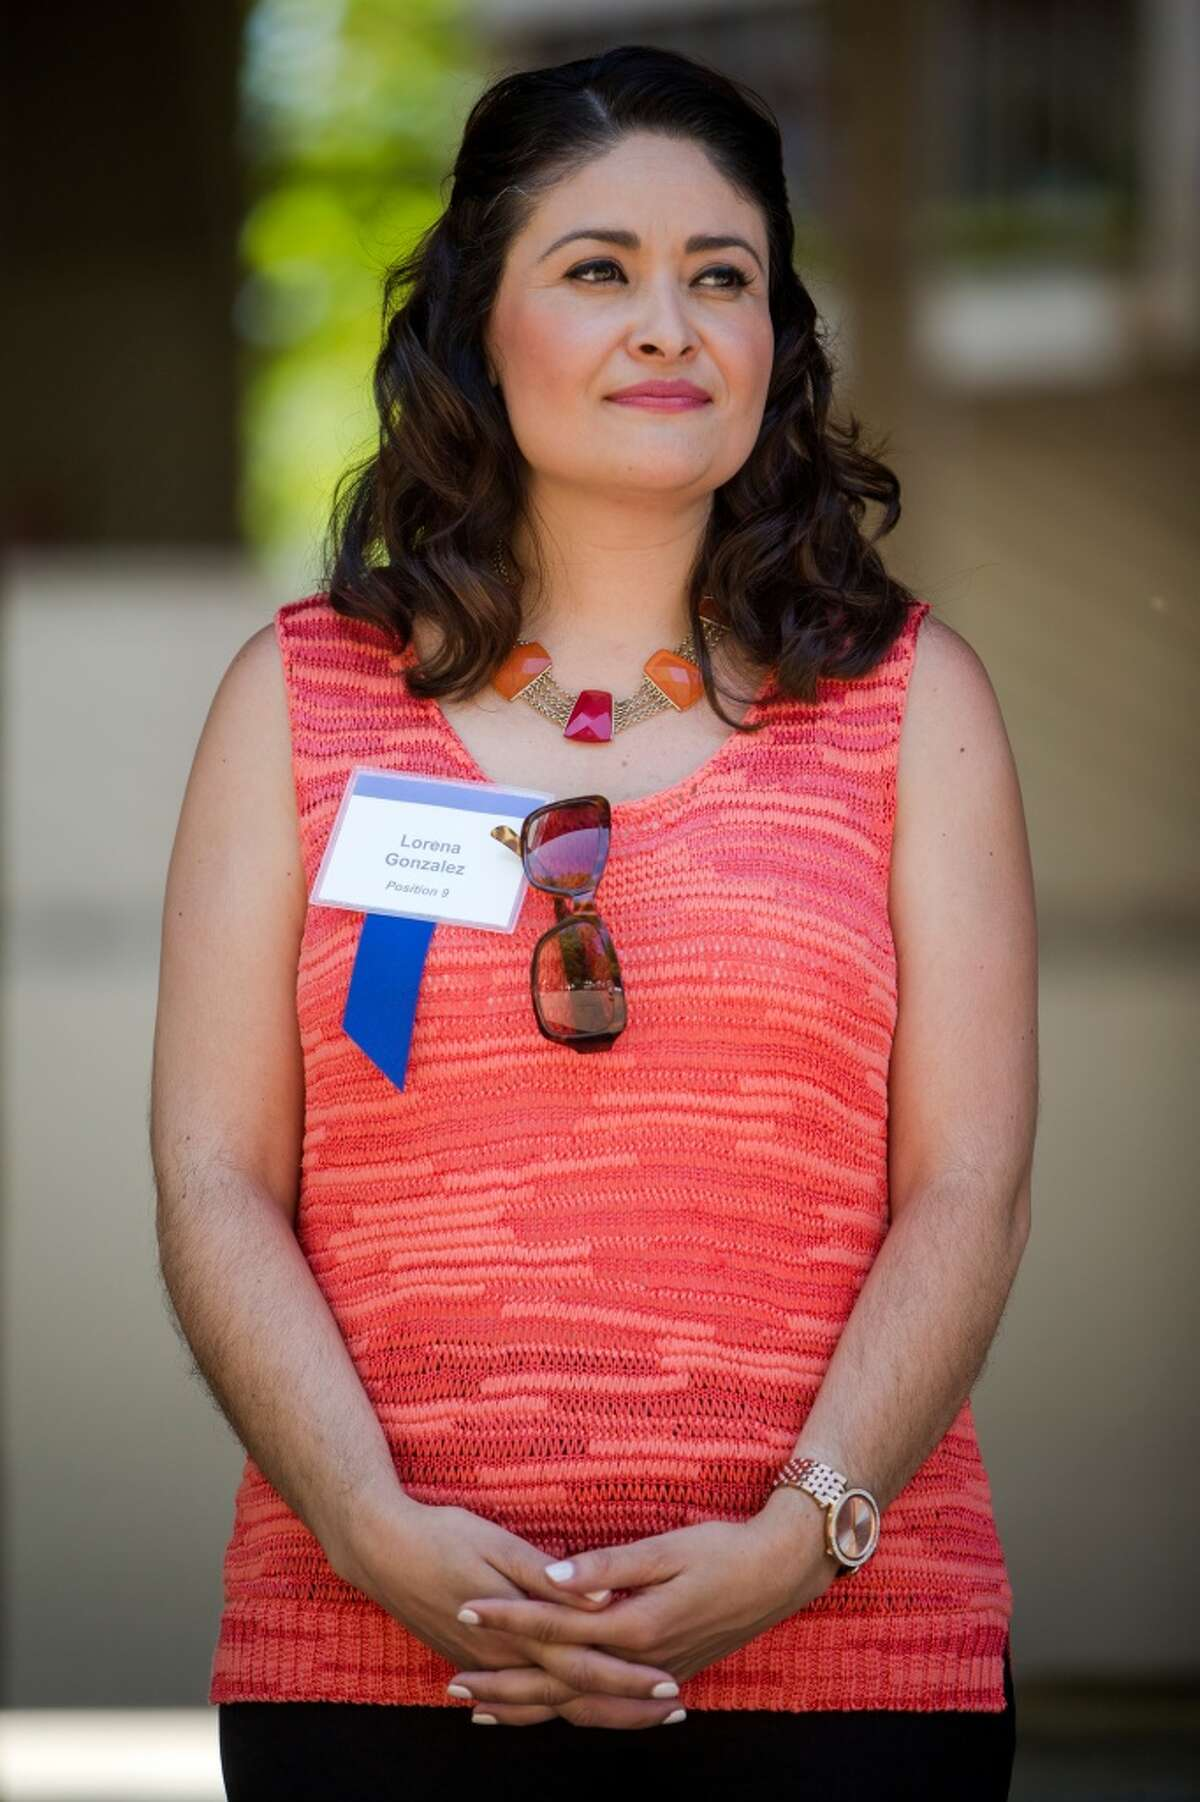 Lorena Gonzalez brought forward an ordinance to ban so-called gay conversion